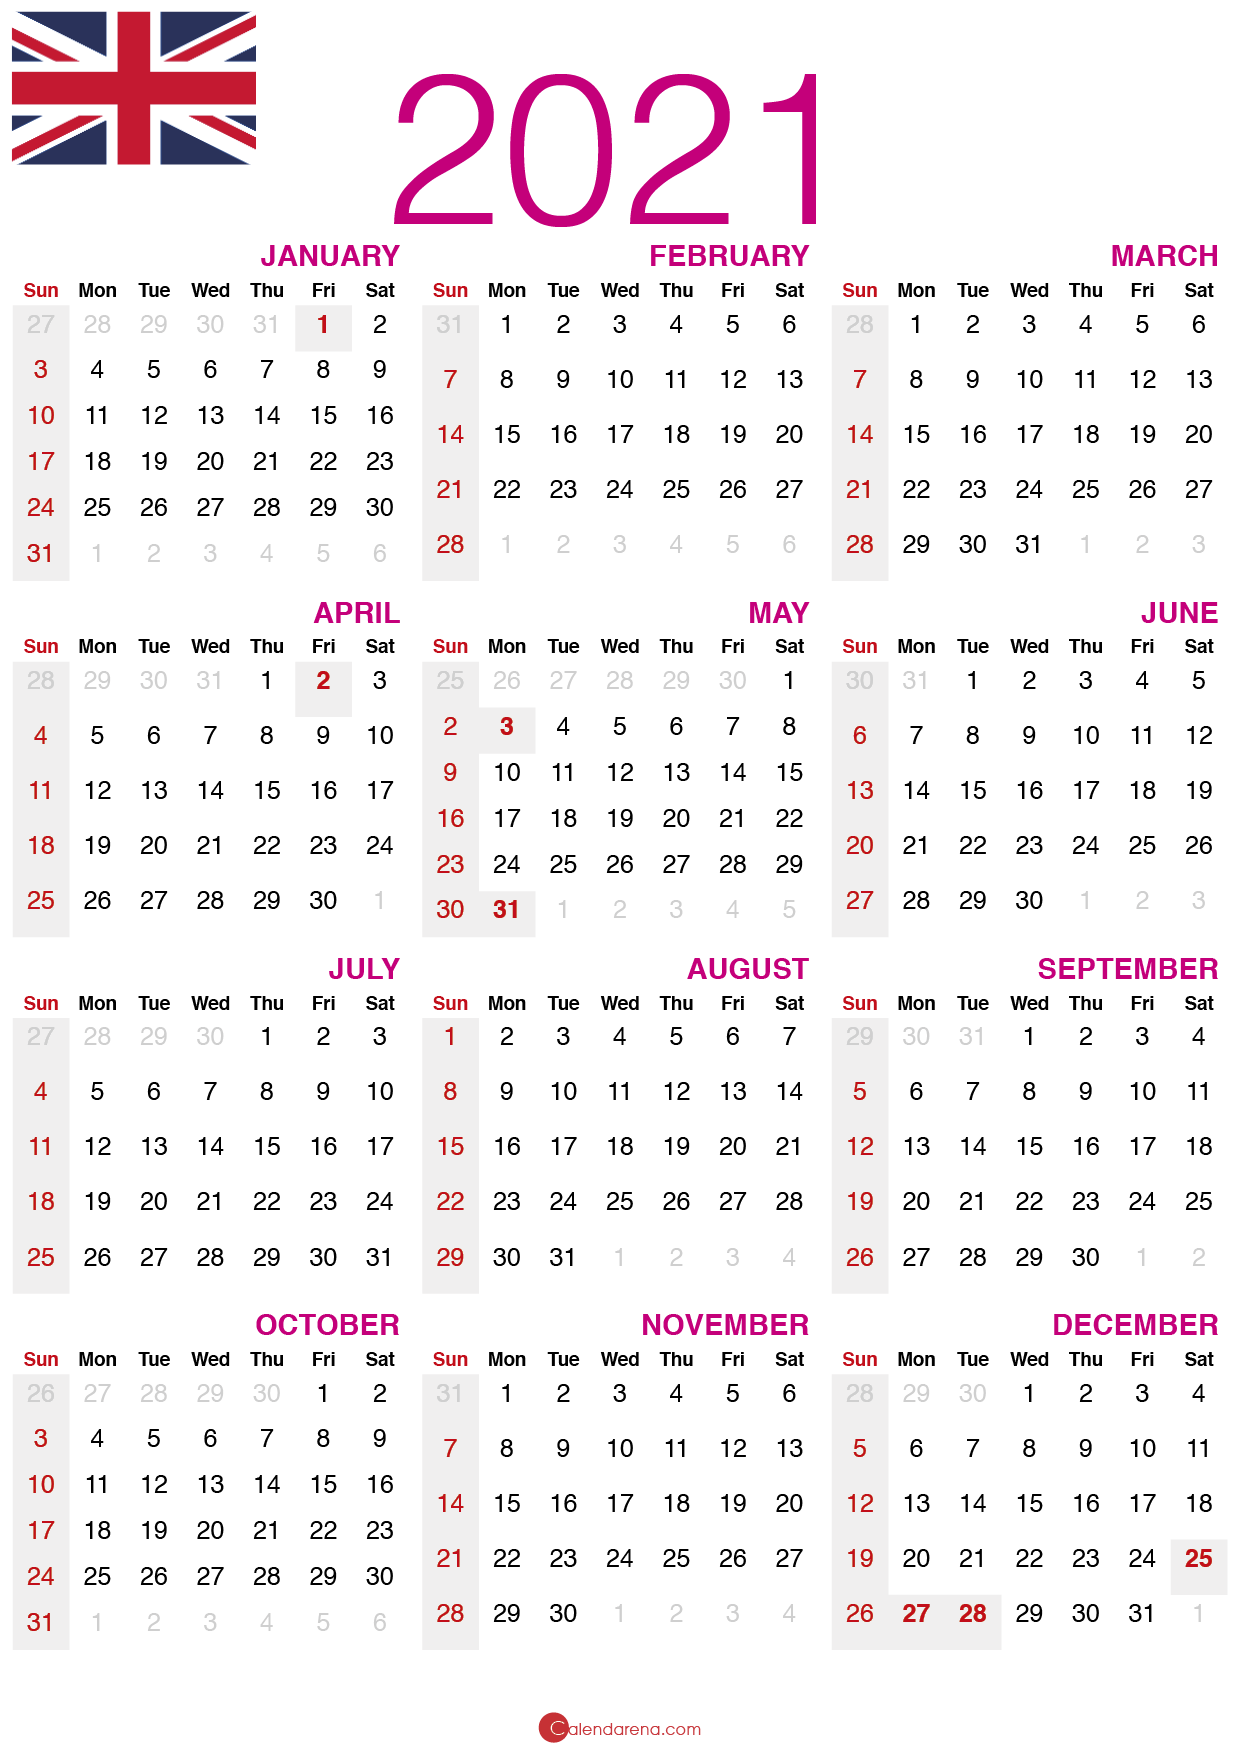 August 2021 Printable Calendar UK